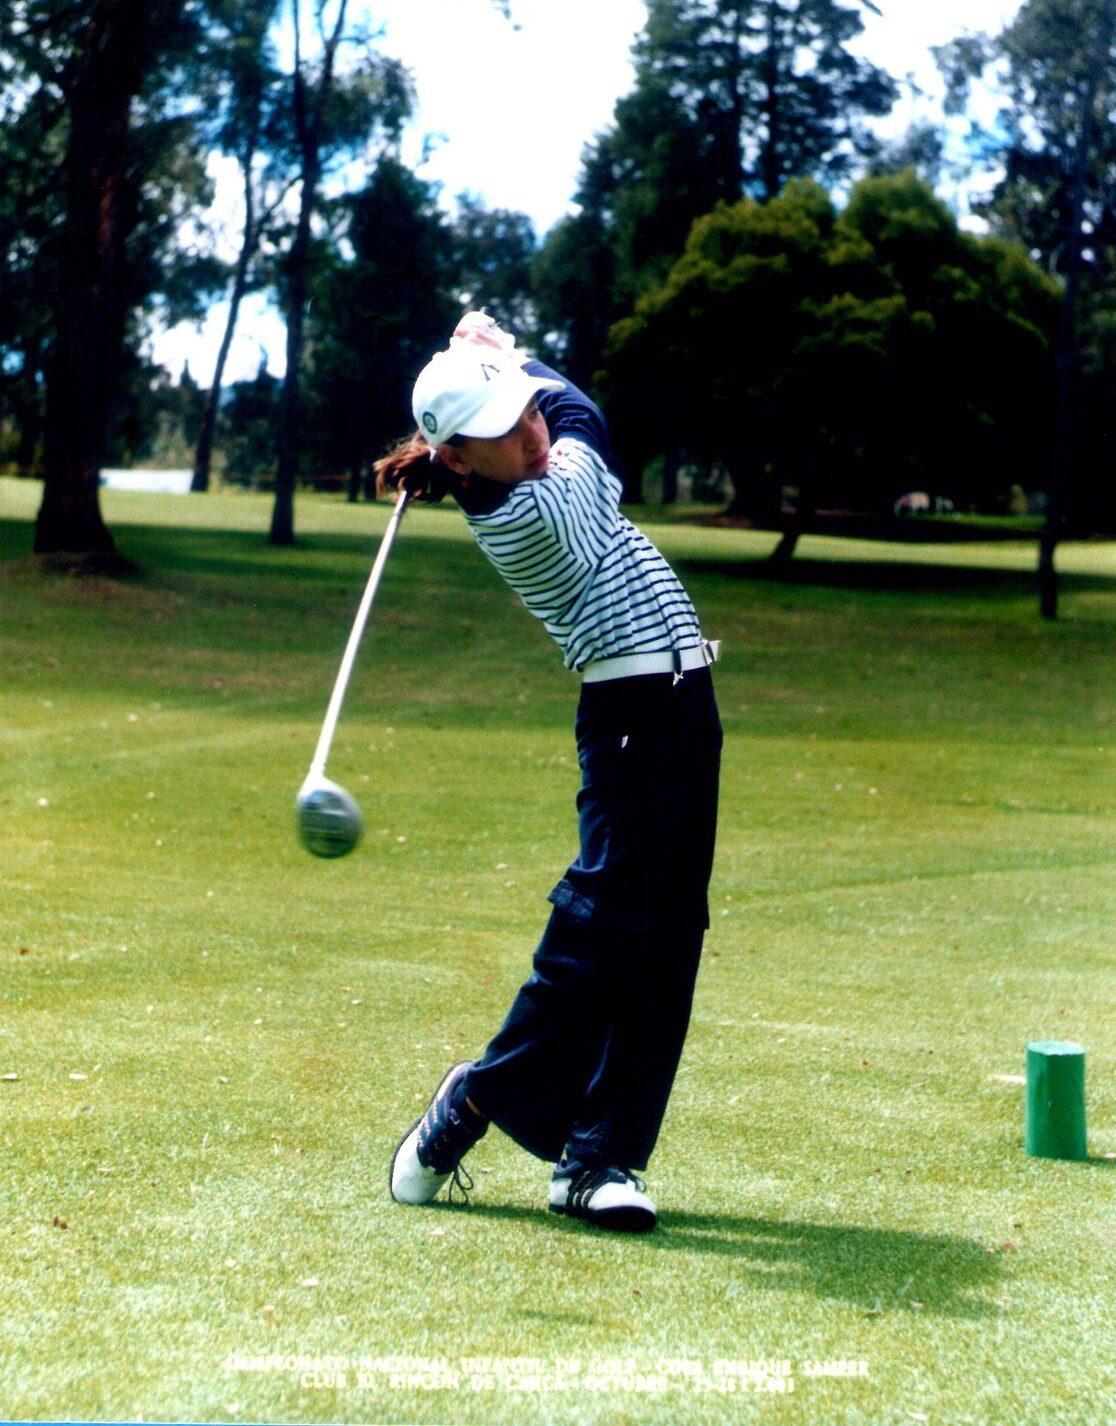 Women playing golf on a green fairway_success, GamePlanA, adidas, golf